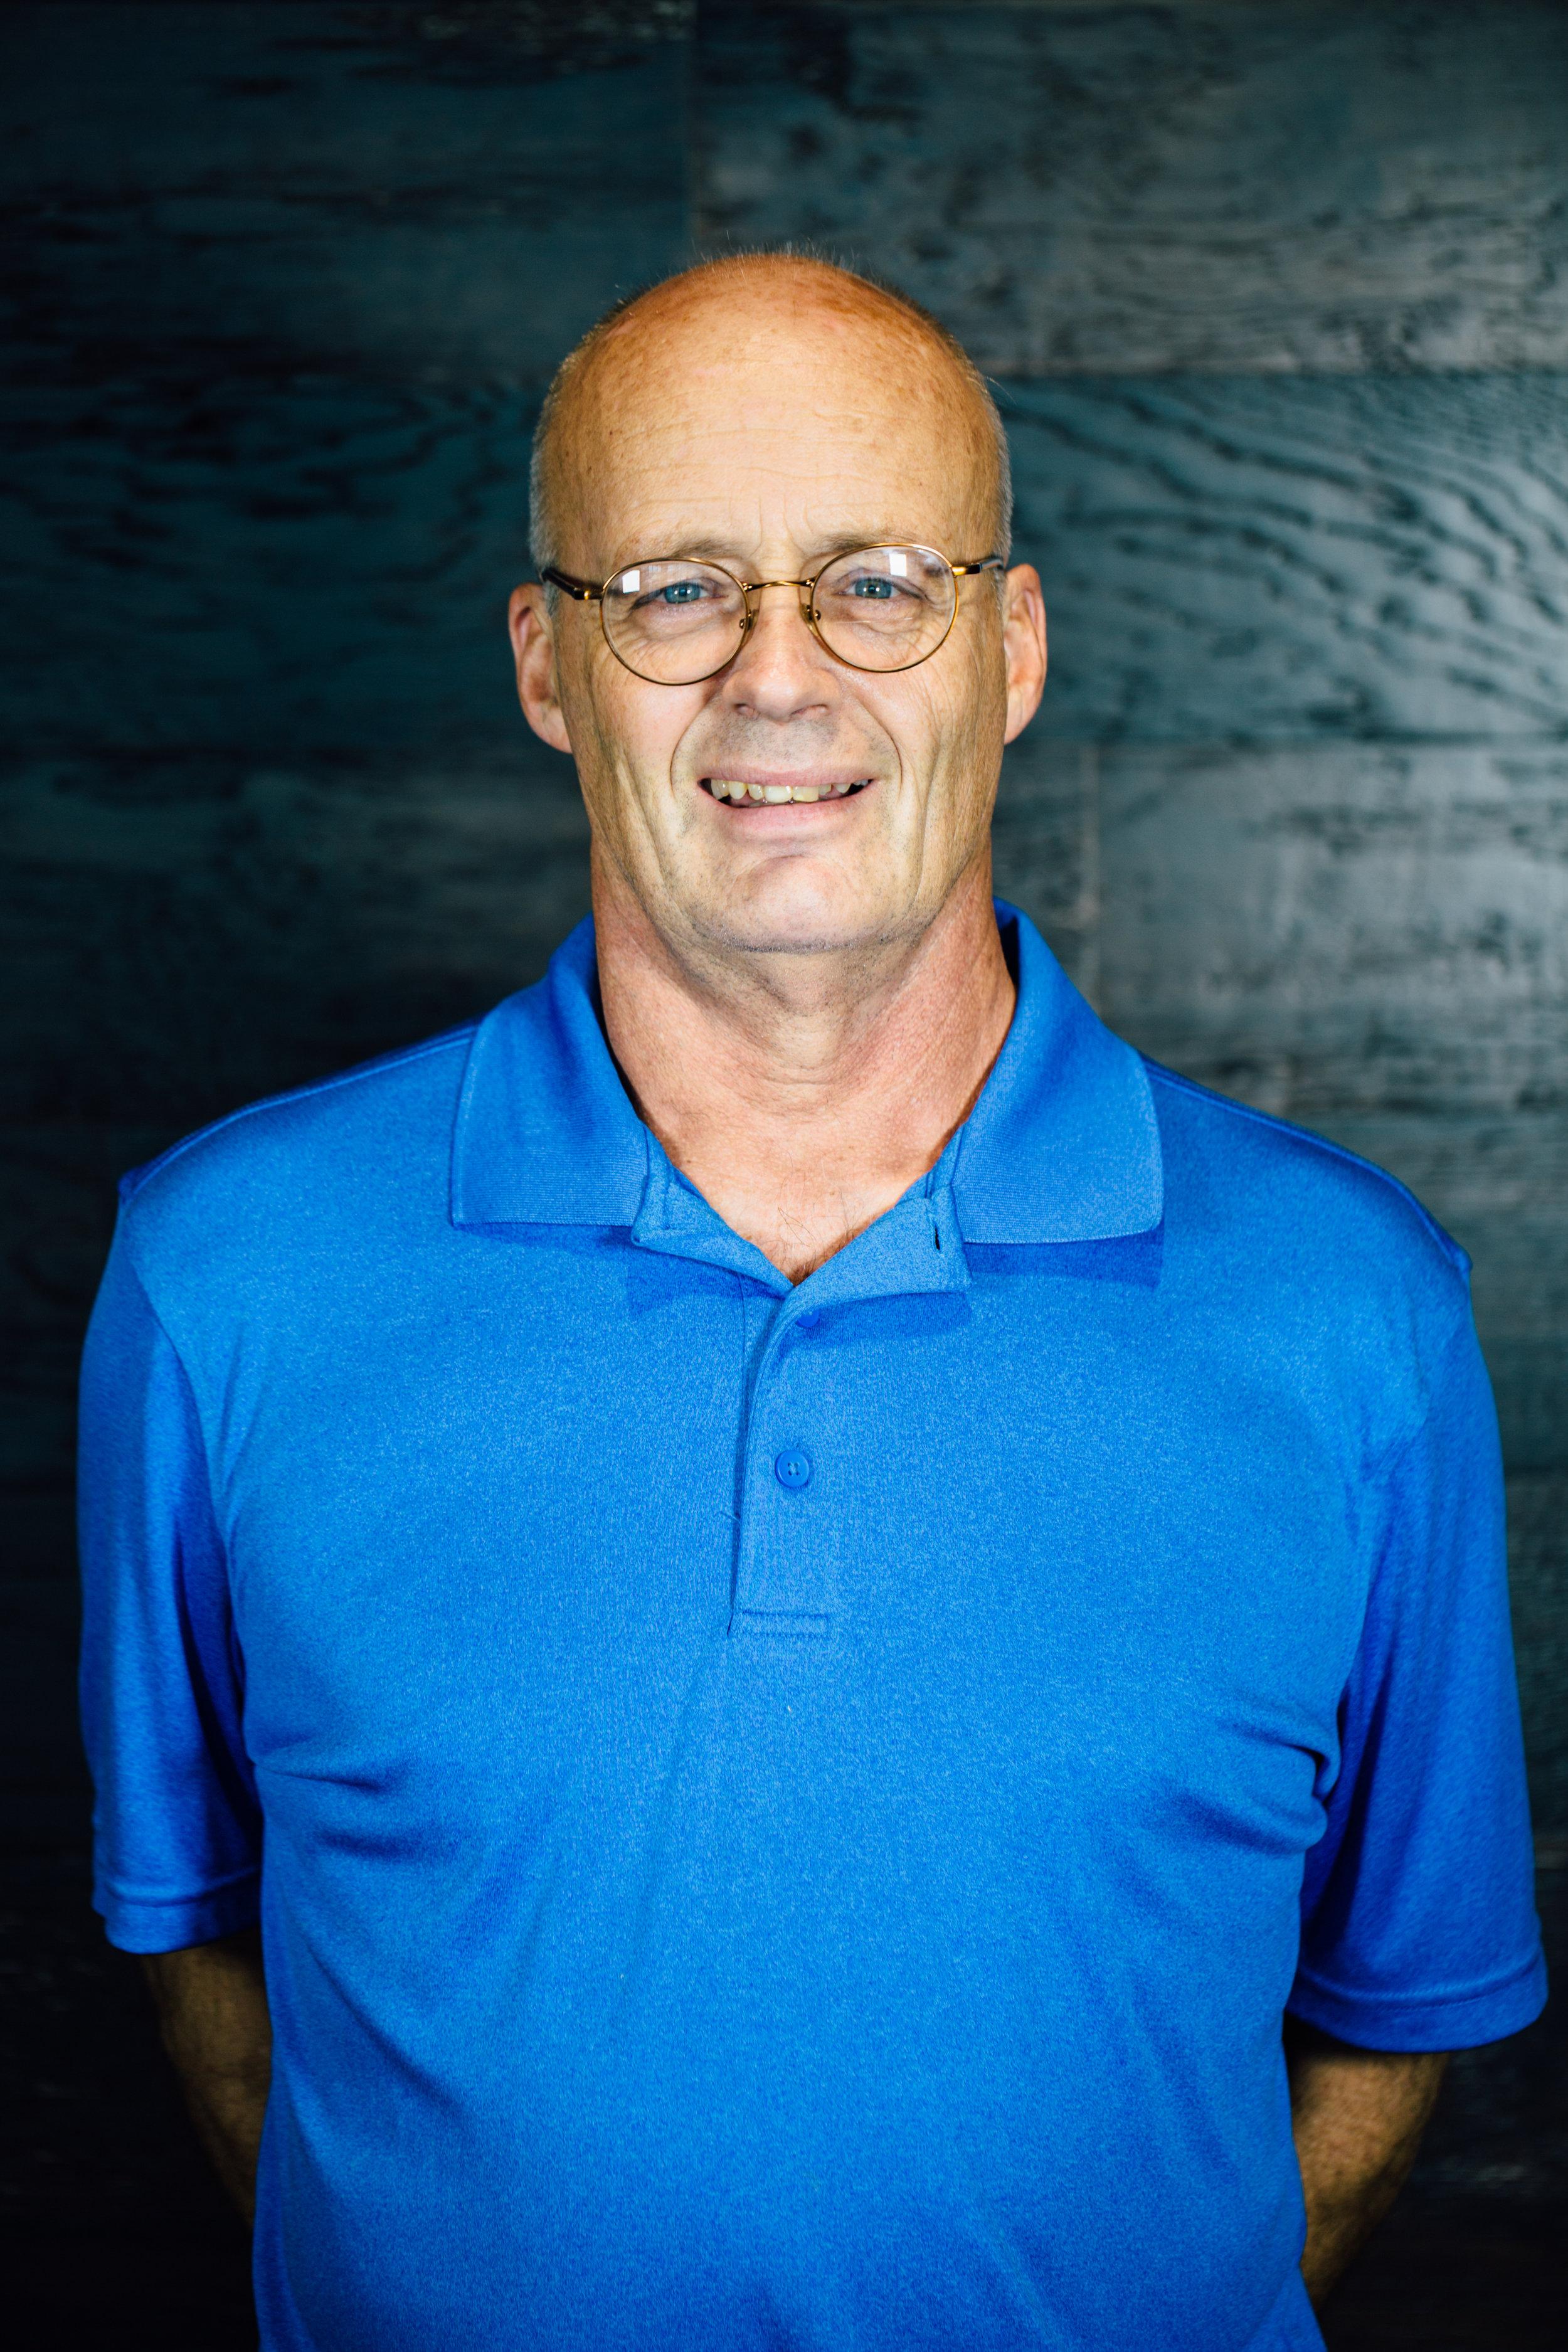 Kirk Roelfsema - Pastoral Minister - krjitek@hotmail.com